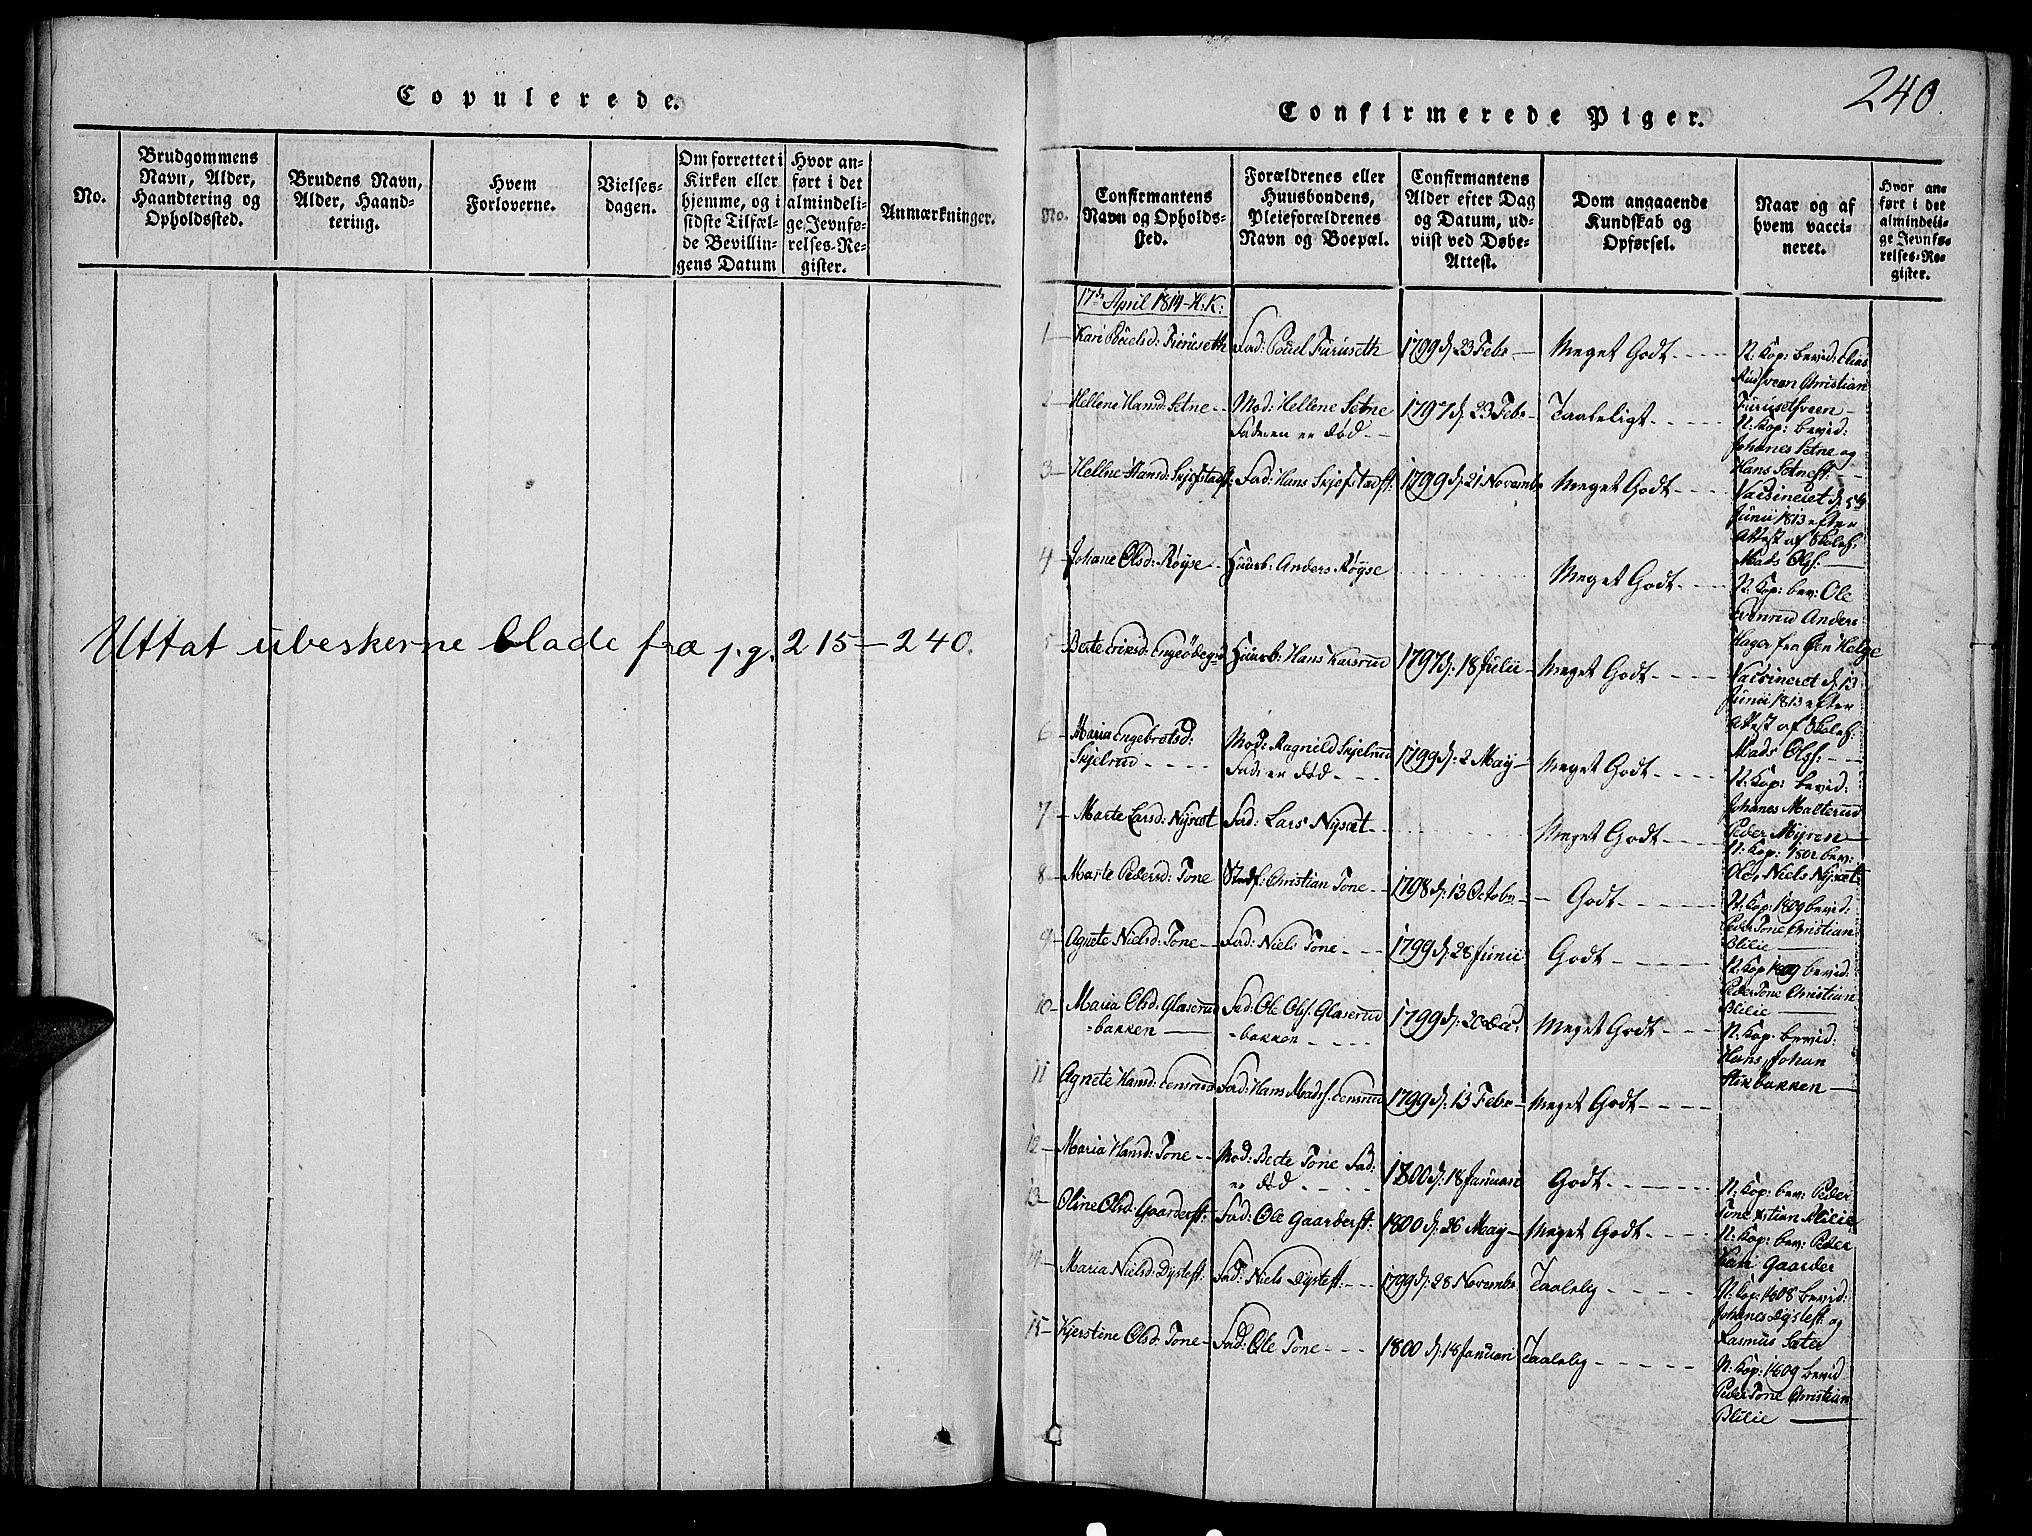 SAH, Toten prestekontor, Ministerialbok nr. 9, 1814-1820, s. 240